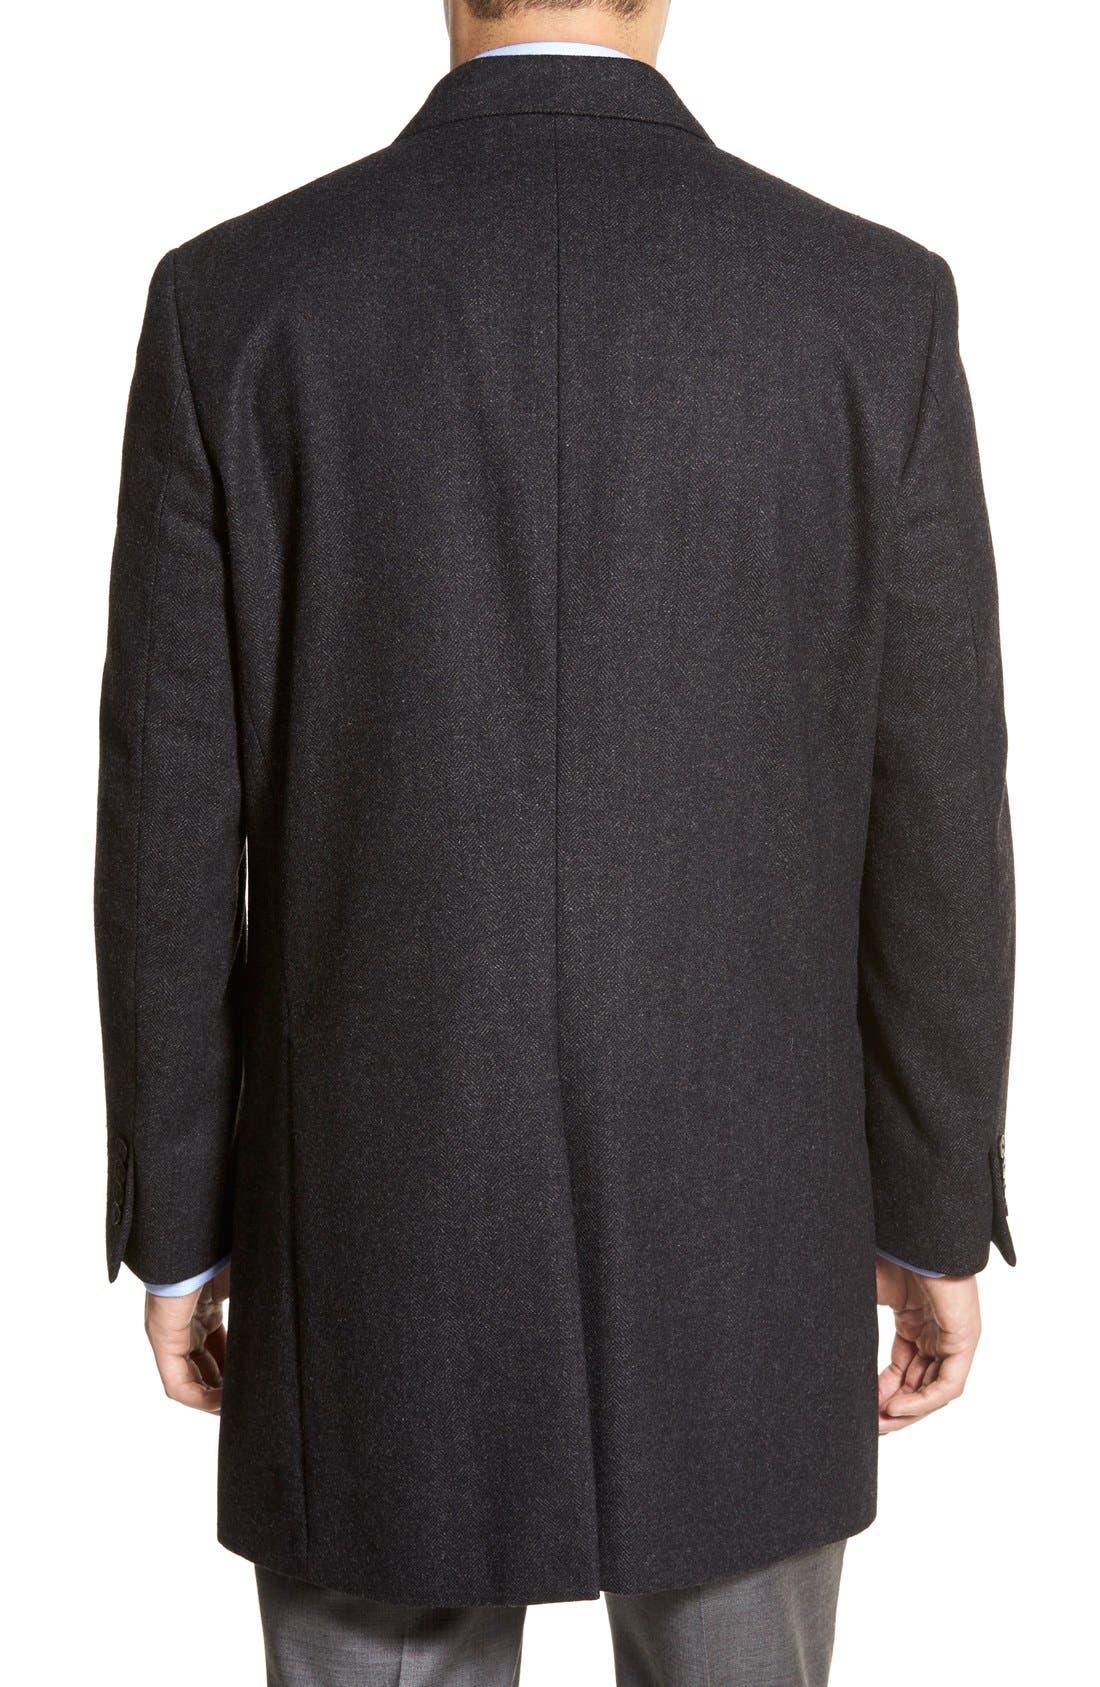 Maitland Modern Fit Wool Blend Overcoat,                             Alternate thumbnail 5, color,                             035